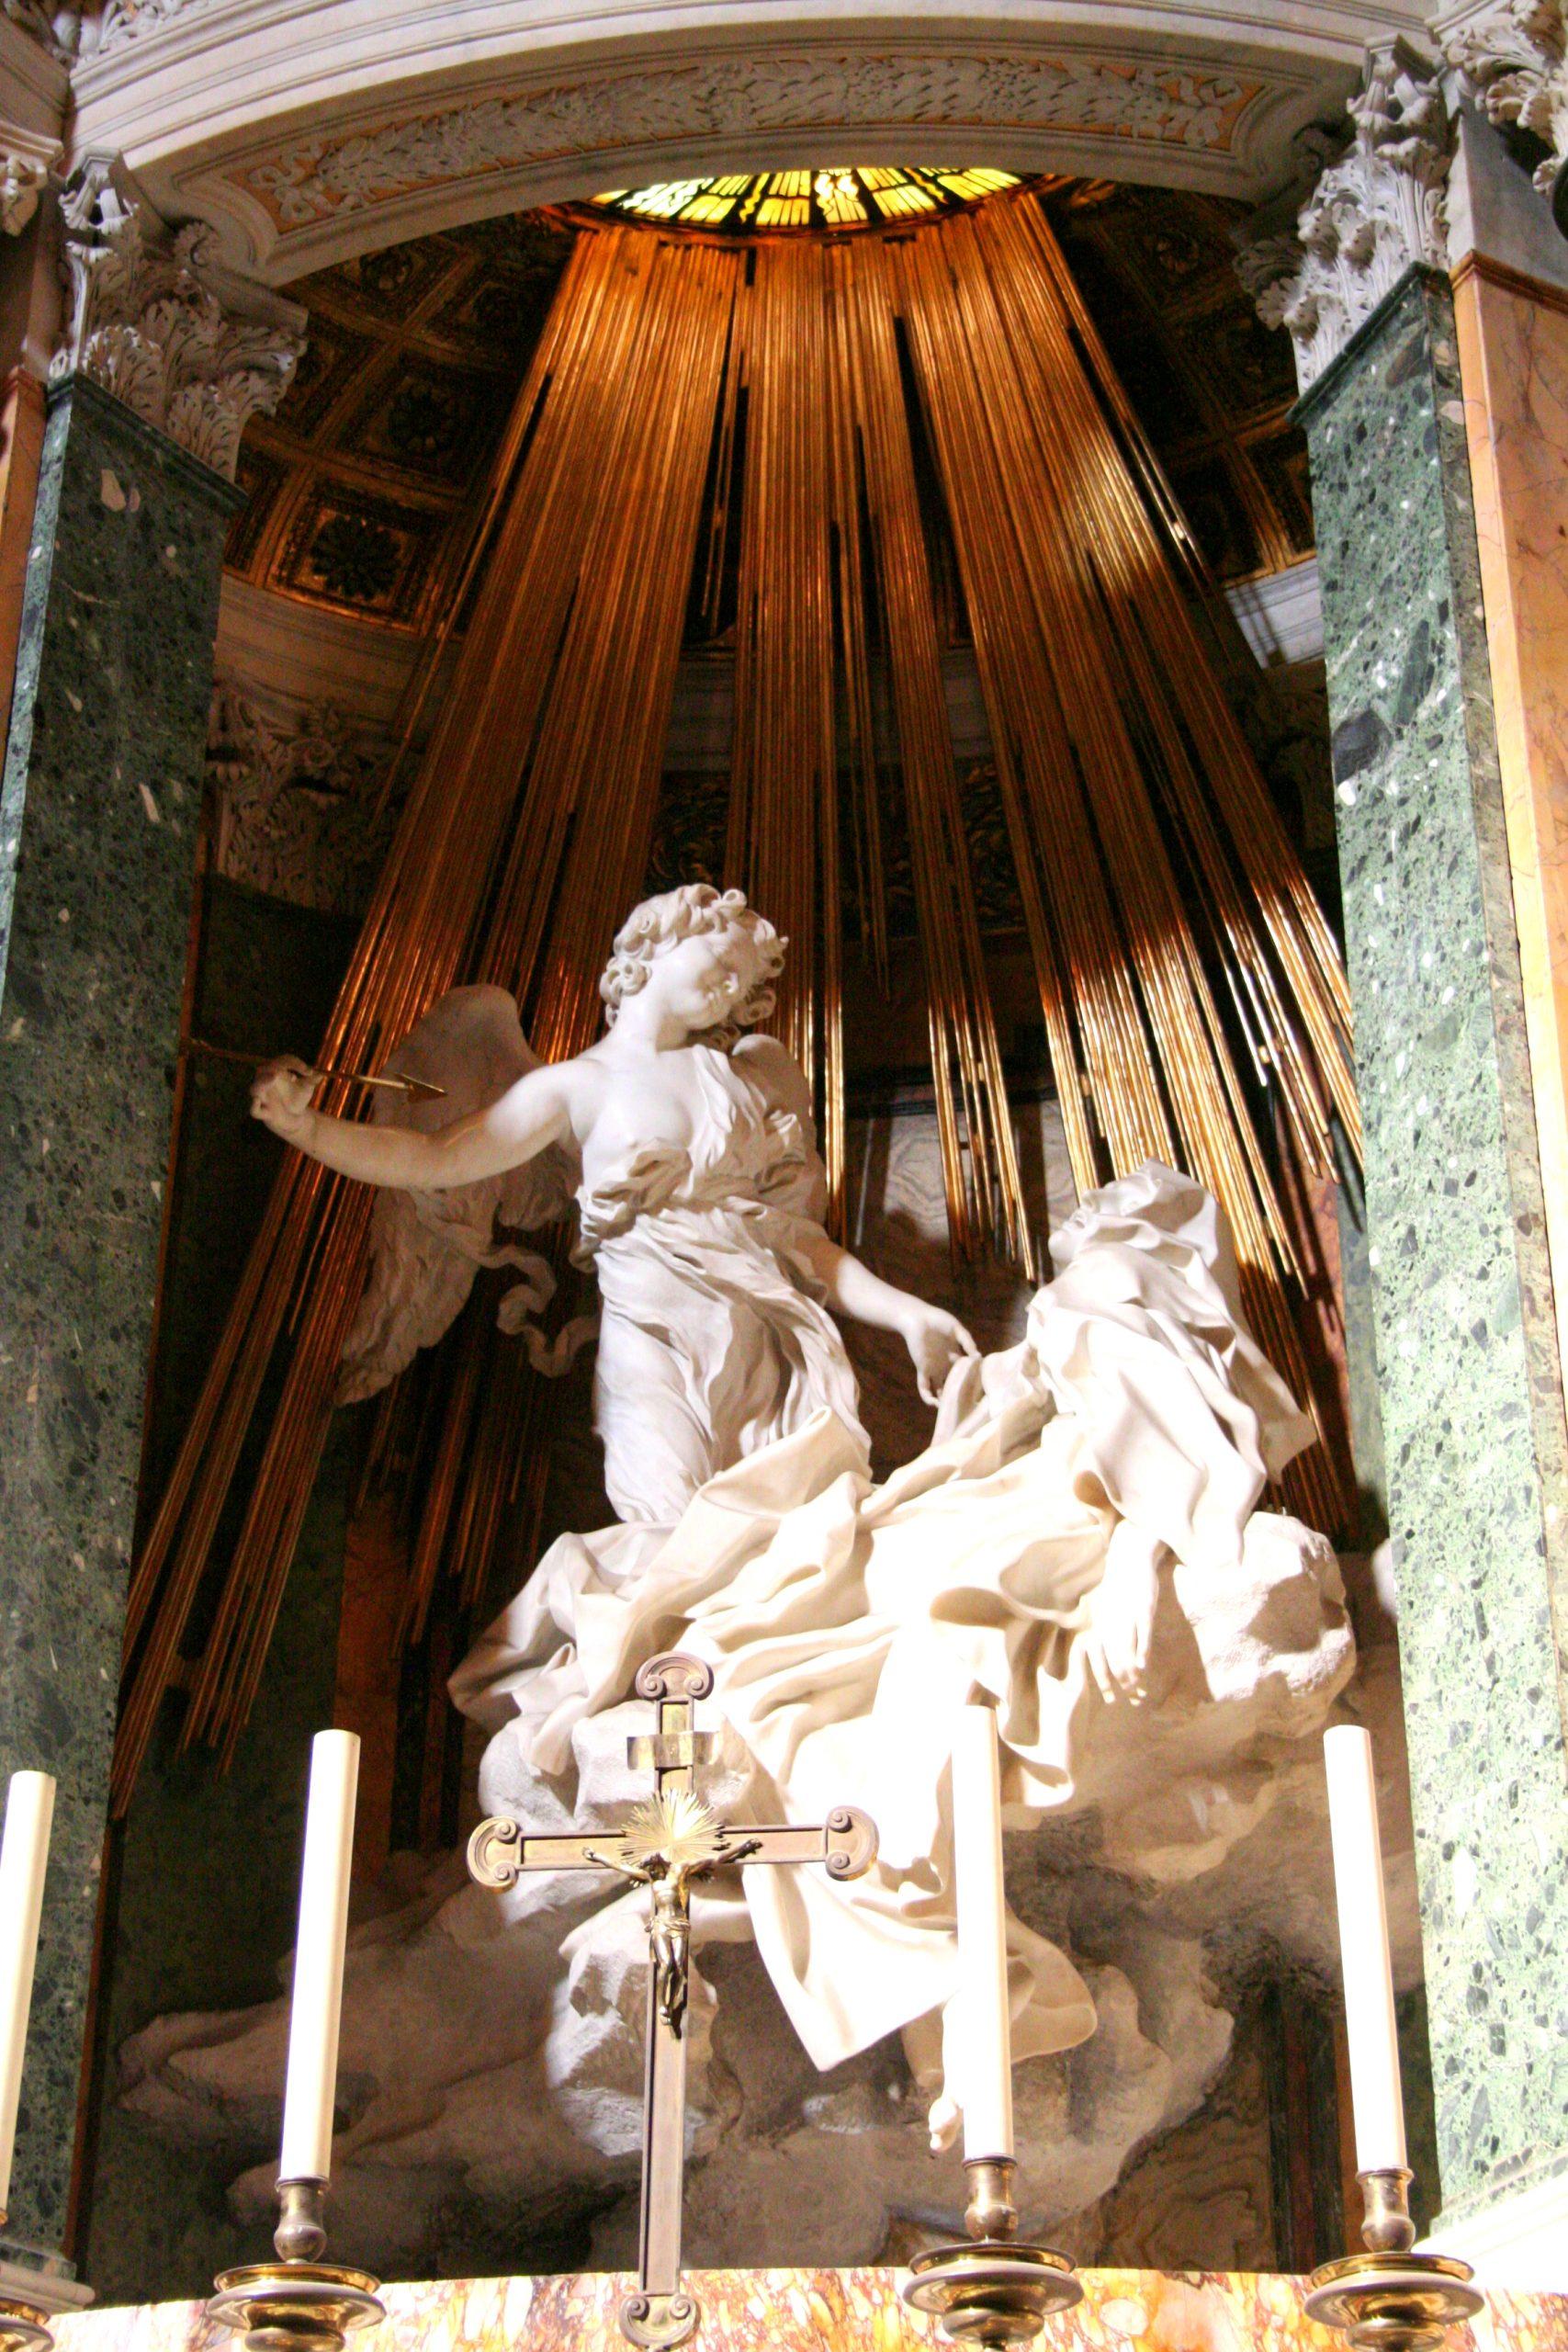 2007, Gian Lorenzo Bernini, <i>The Ecstasy of Saint Teresa</i>, Chiesa di Santa Maria della Vittoria, Rome, Italy